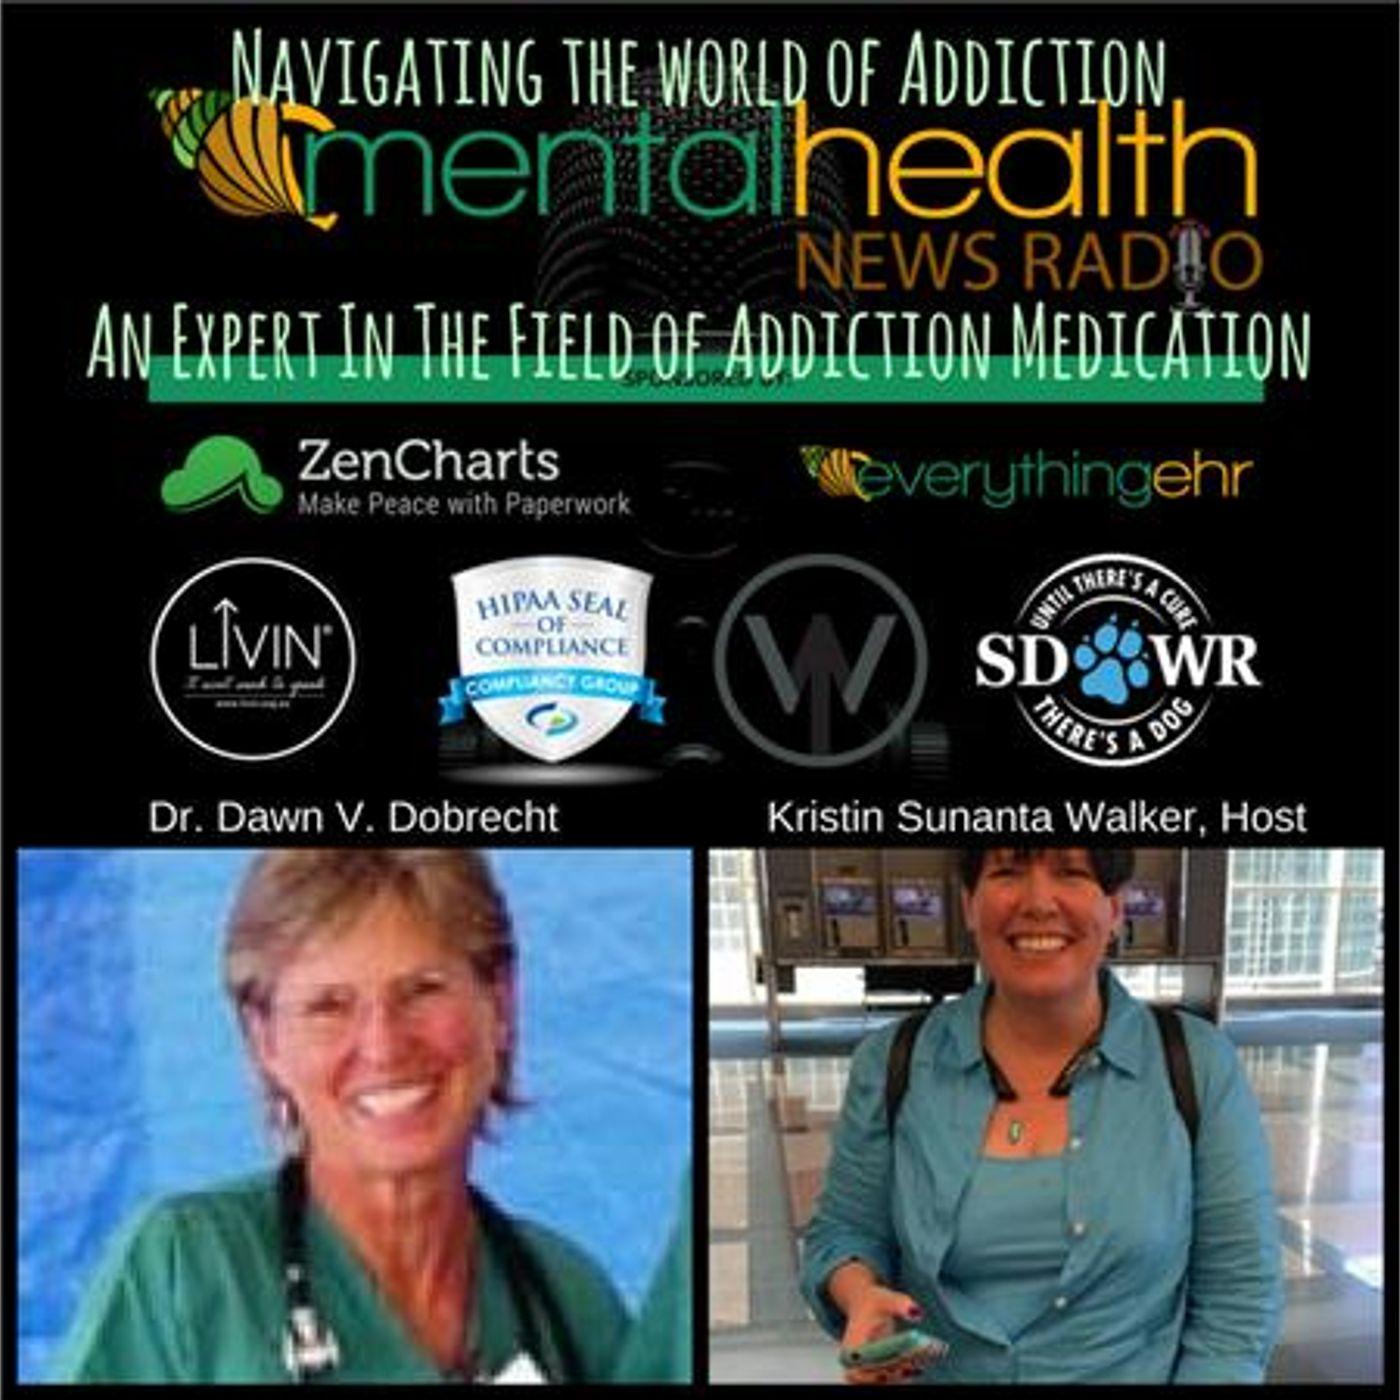 Mental Health News Radio - An Expert In The Field of Addiction Dr. Dawn V. Obrecht